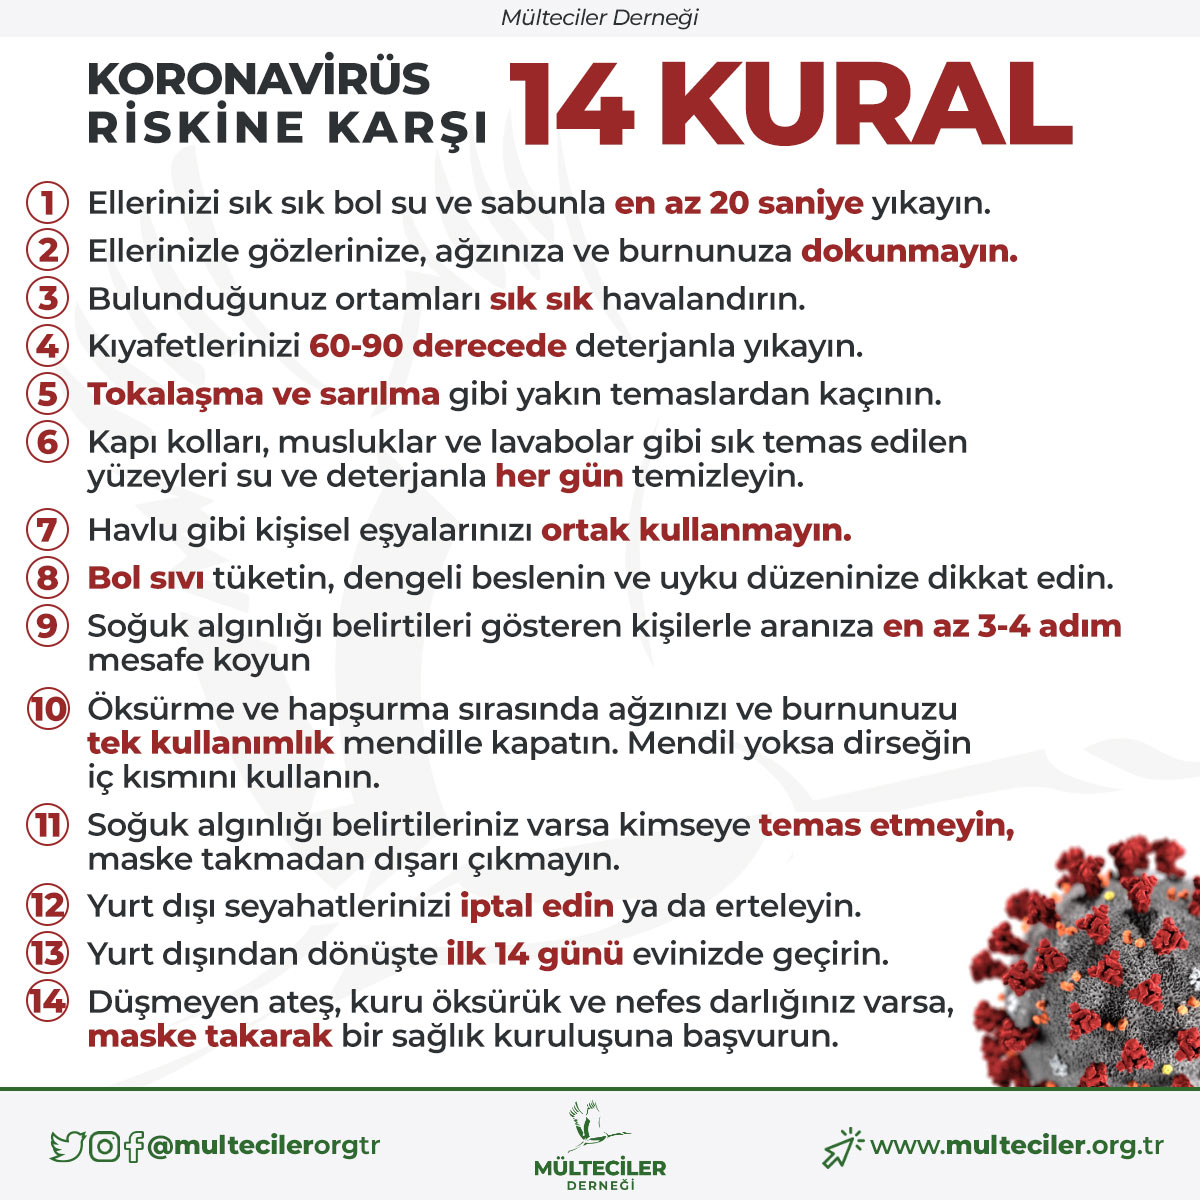 Koronavirüs Riskine Karşı 14 Kural Türkçe